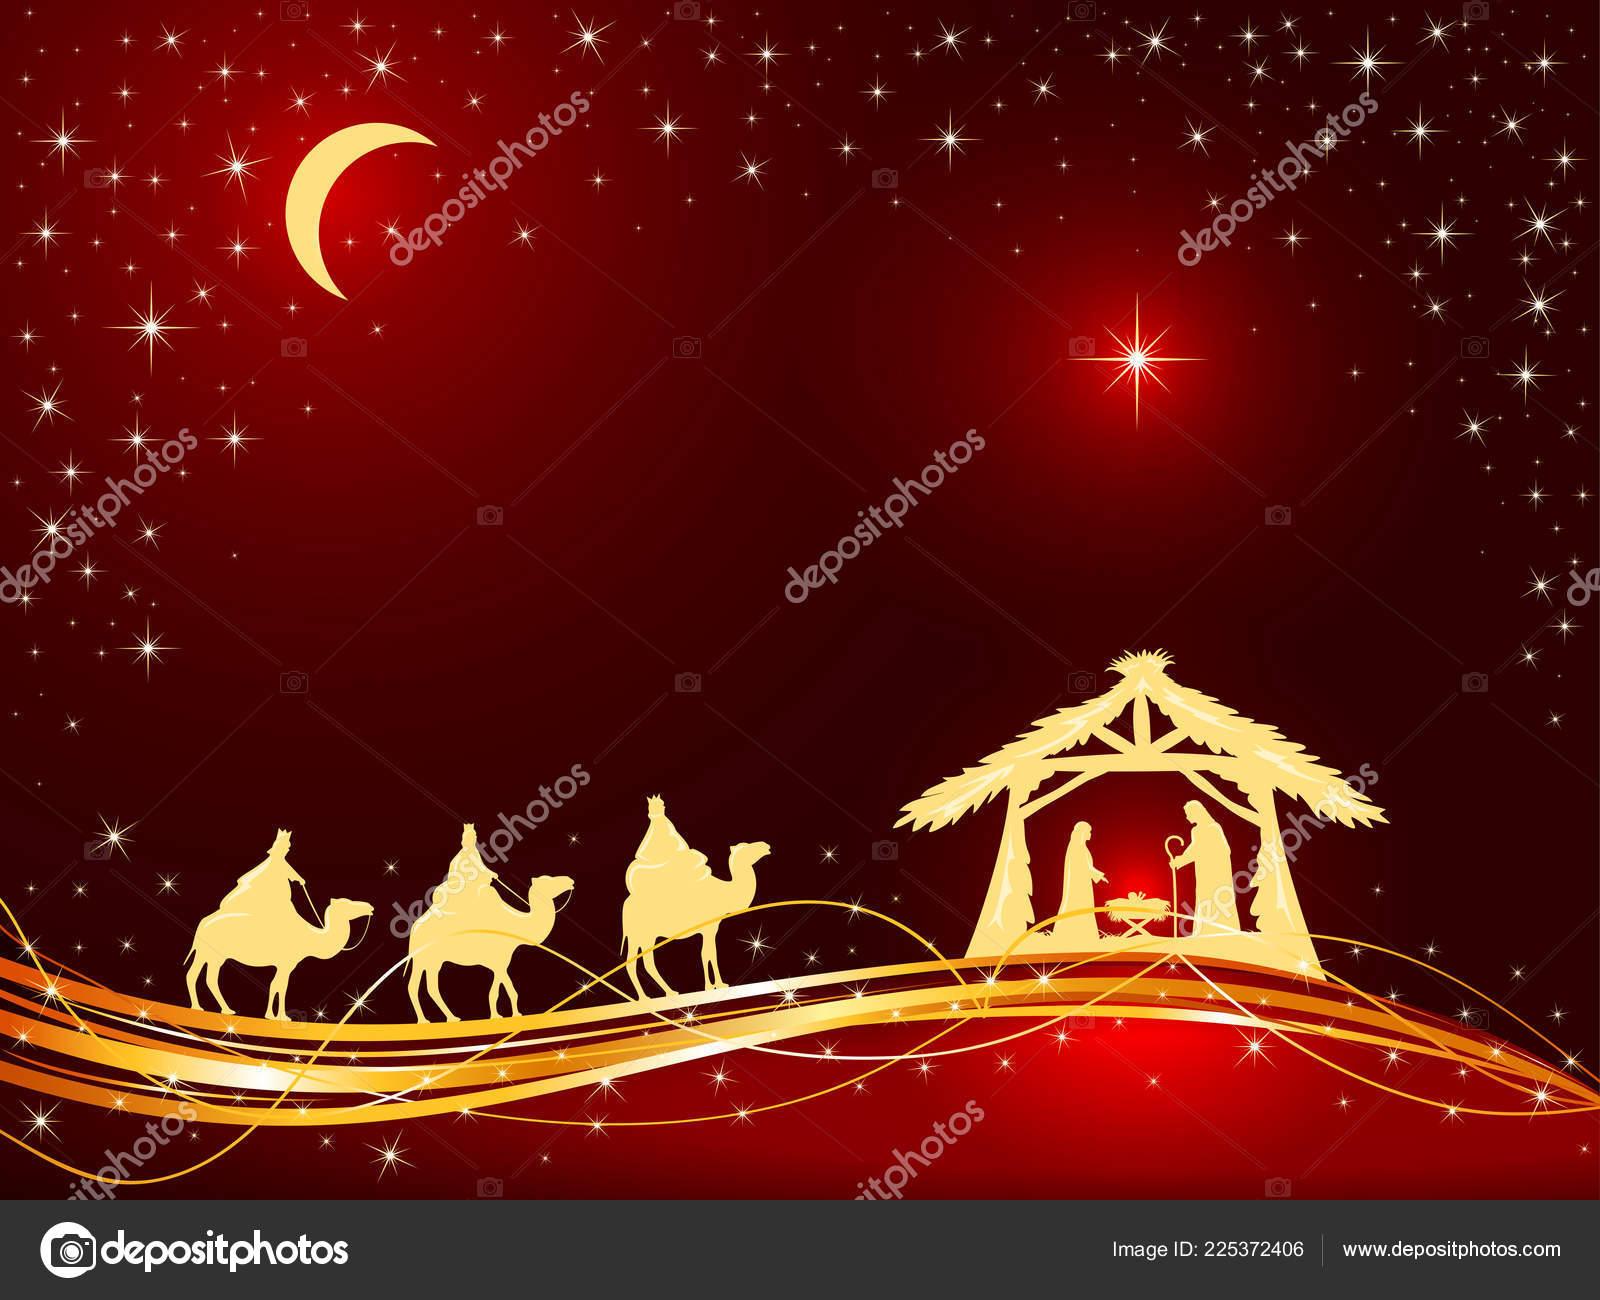 Christian Christmas Theme Birth Jesus Shining Star Three Wise Men ...